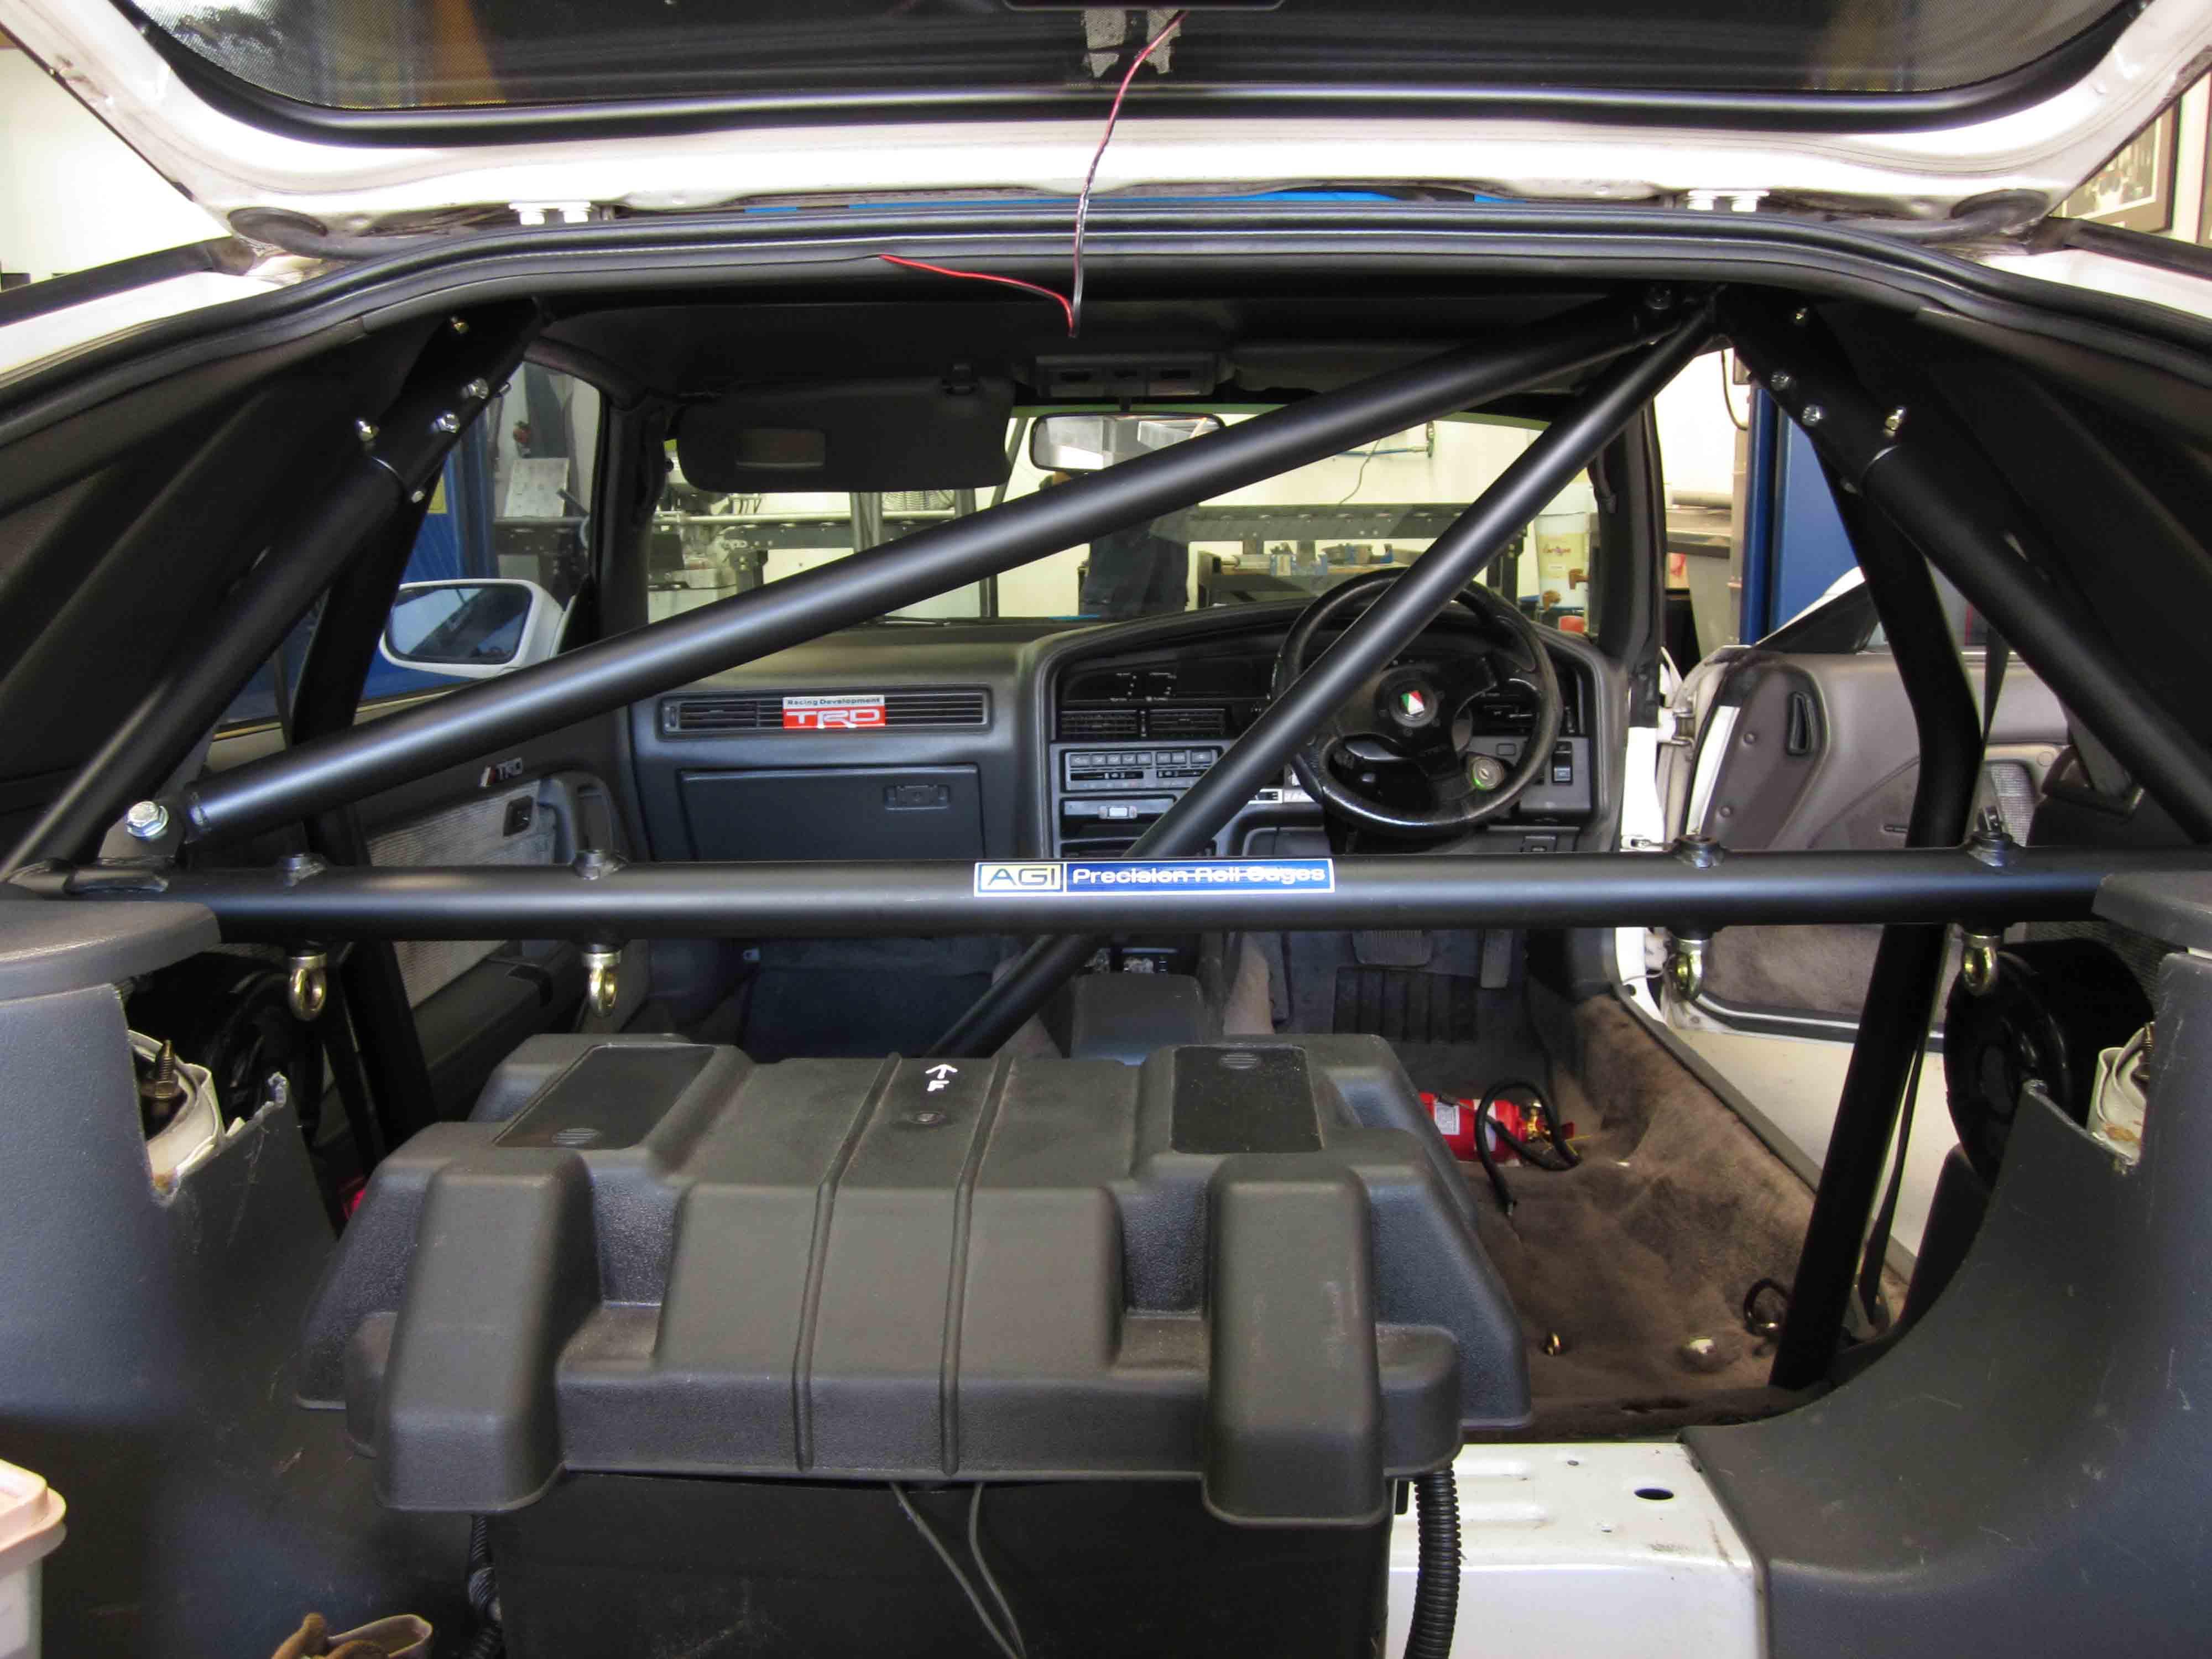 350z stereo wiring diagram  a  toyota supra mk3 4pt half cage bolt in agi   a  toyota supra mk3 4pt half cage bolt in agi